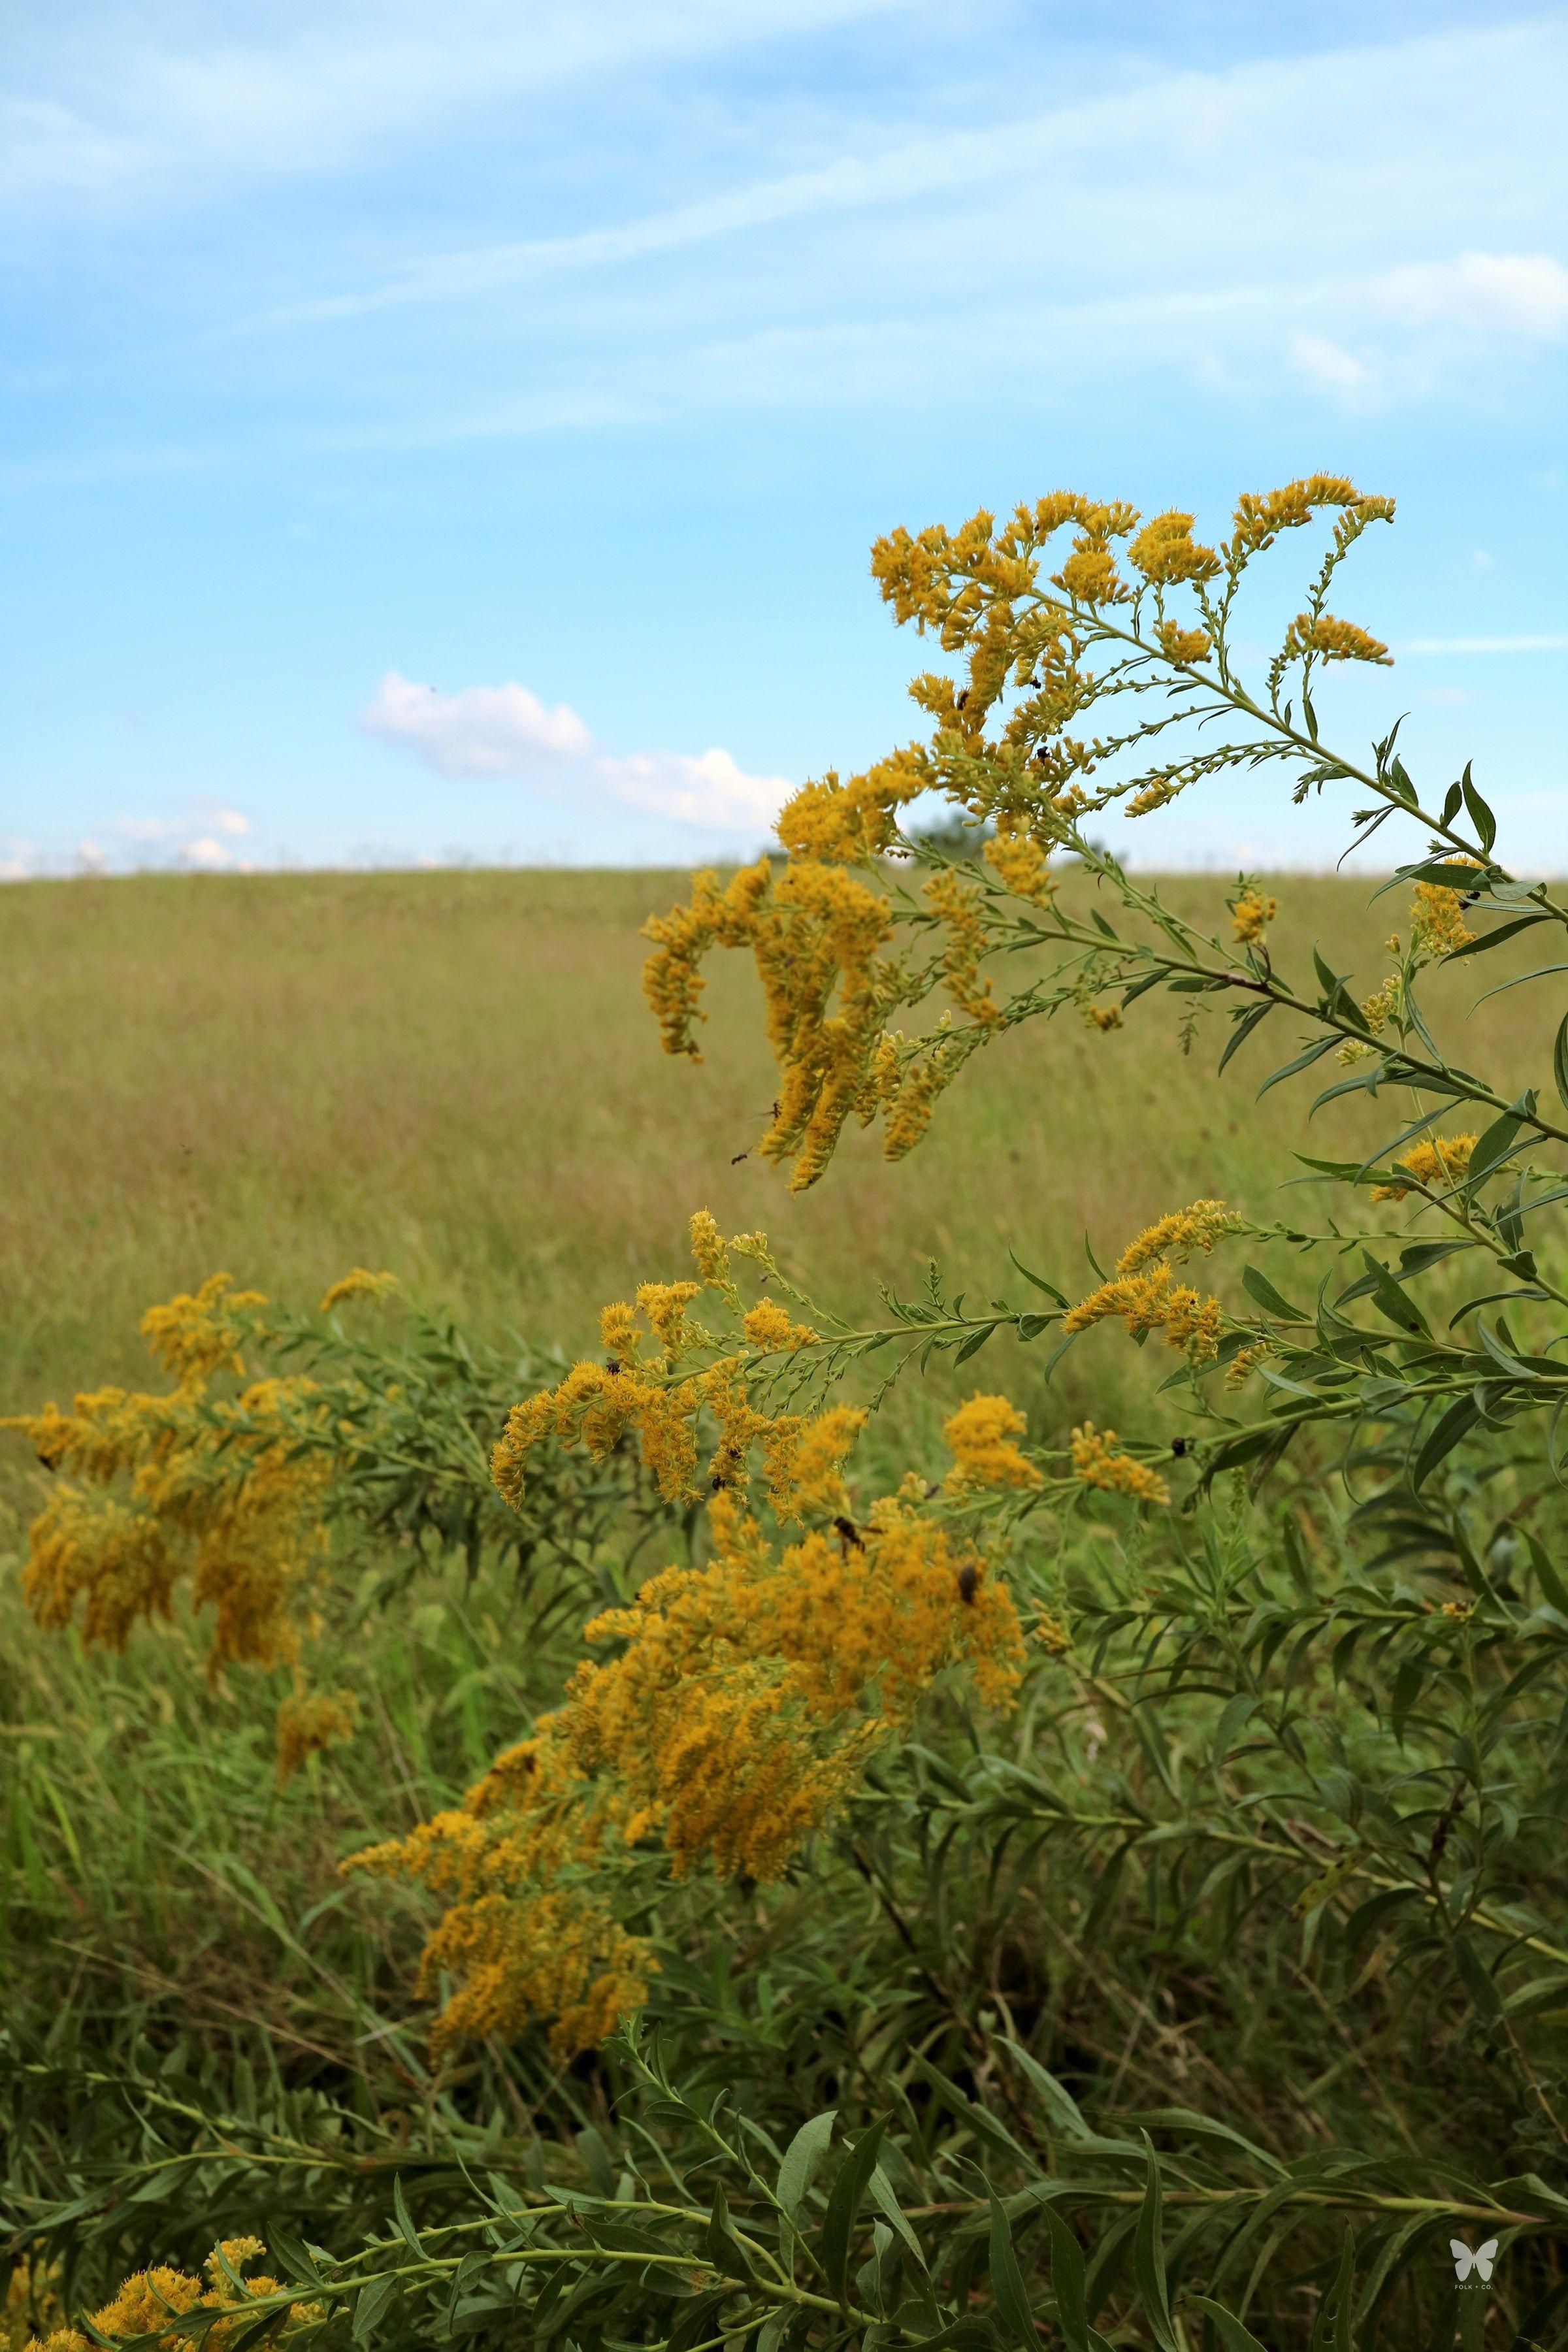 10 Uses For Goldenrod Super Helpful Info Plant Life Goldenrod Wild Plants